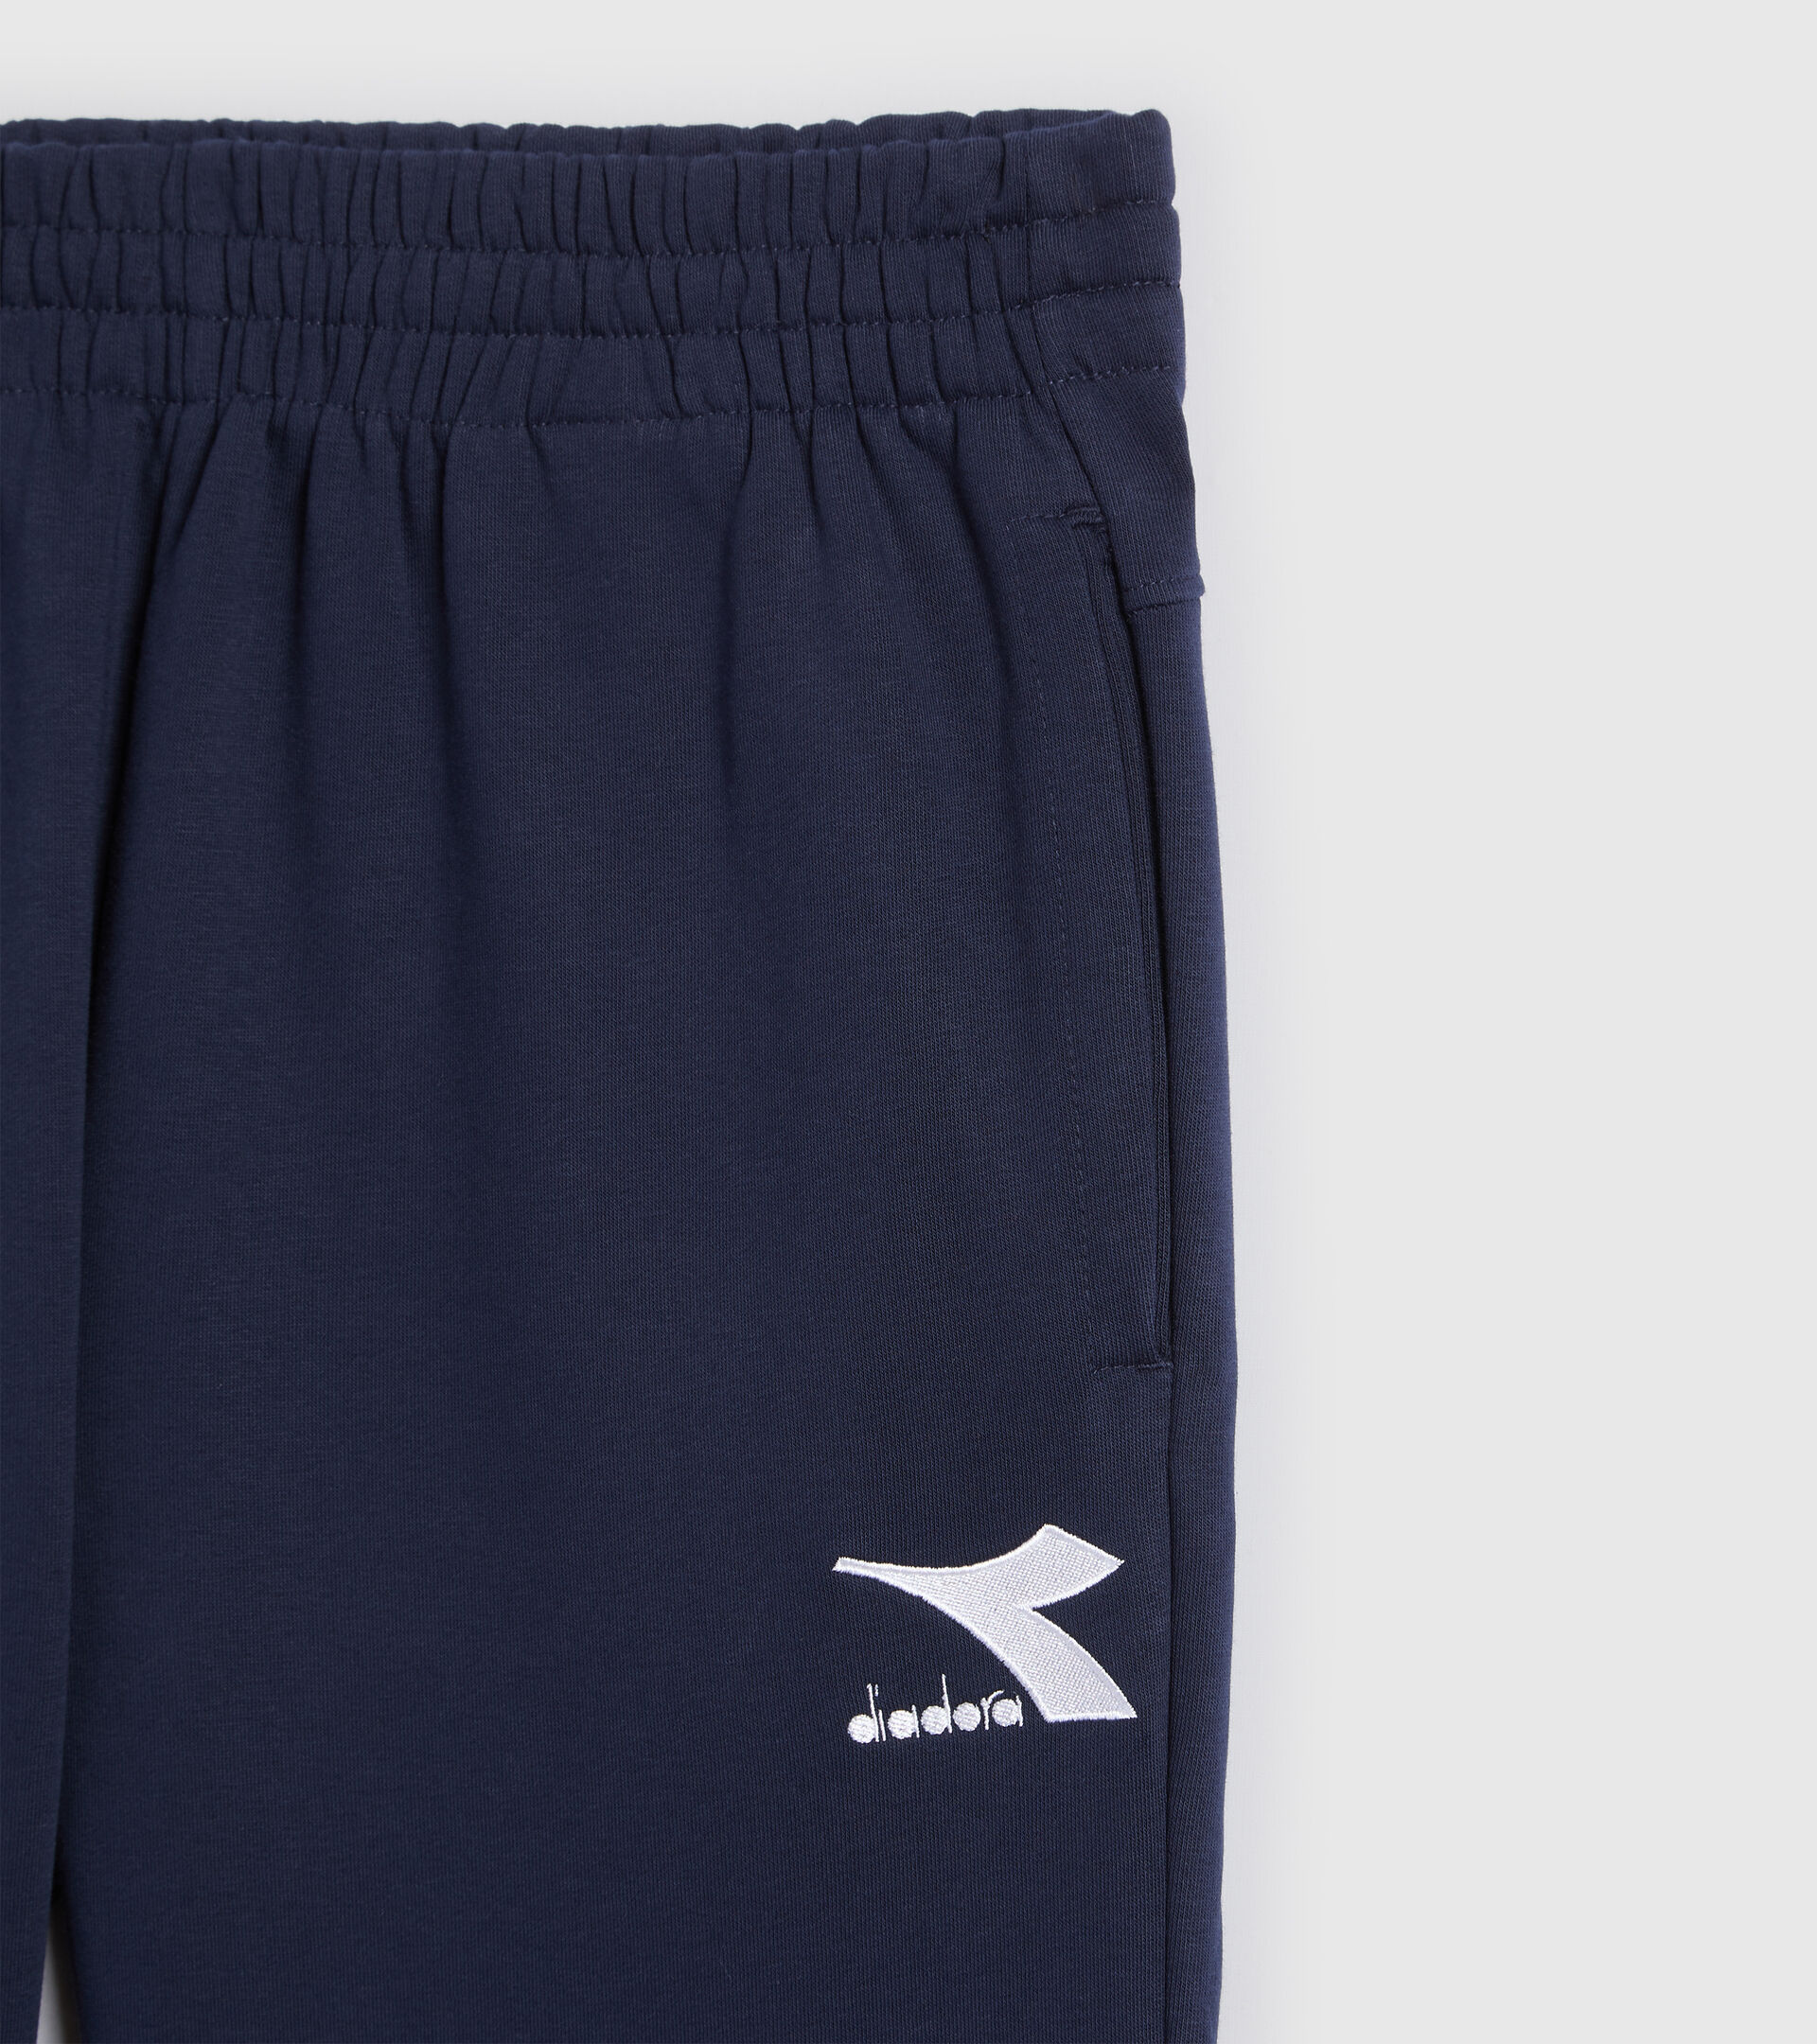 Sporthose - Herren PANTS CUFF CORE CABAN BLAU - Diadora